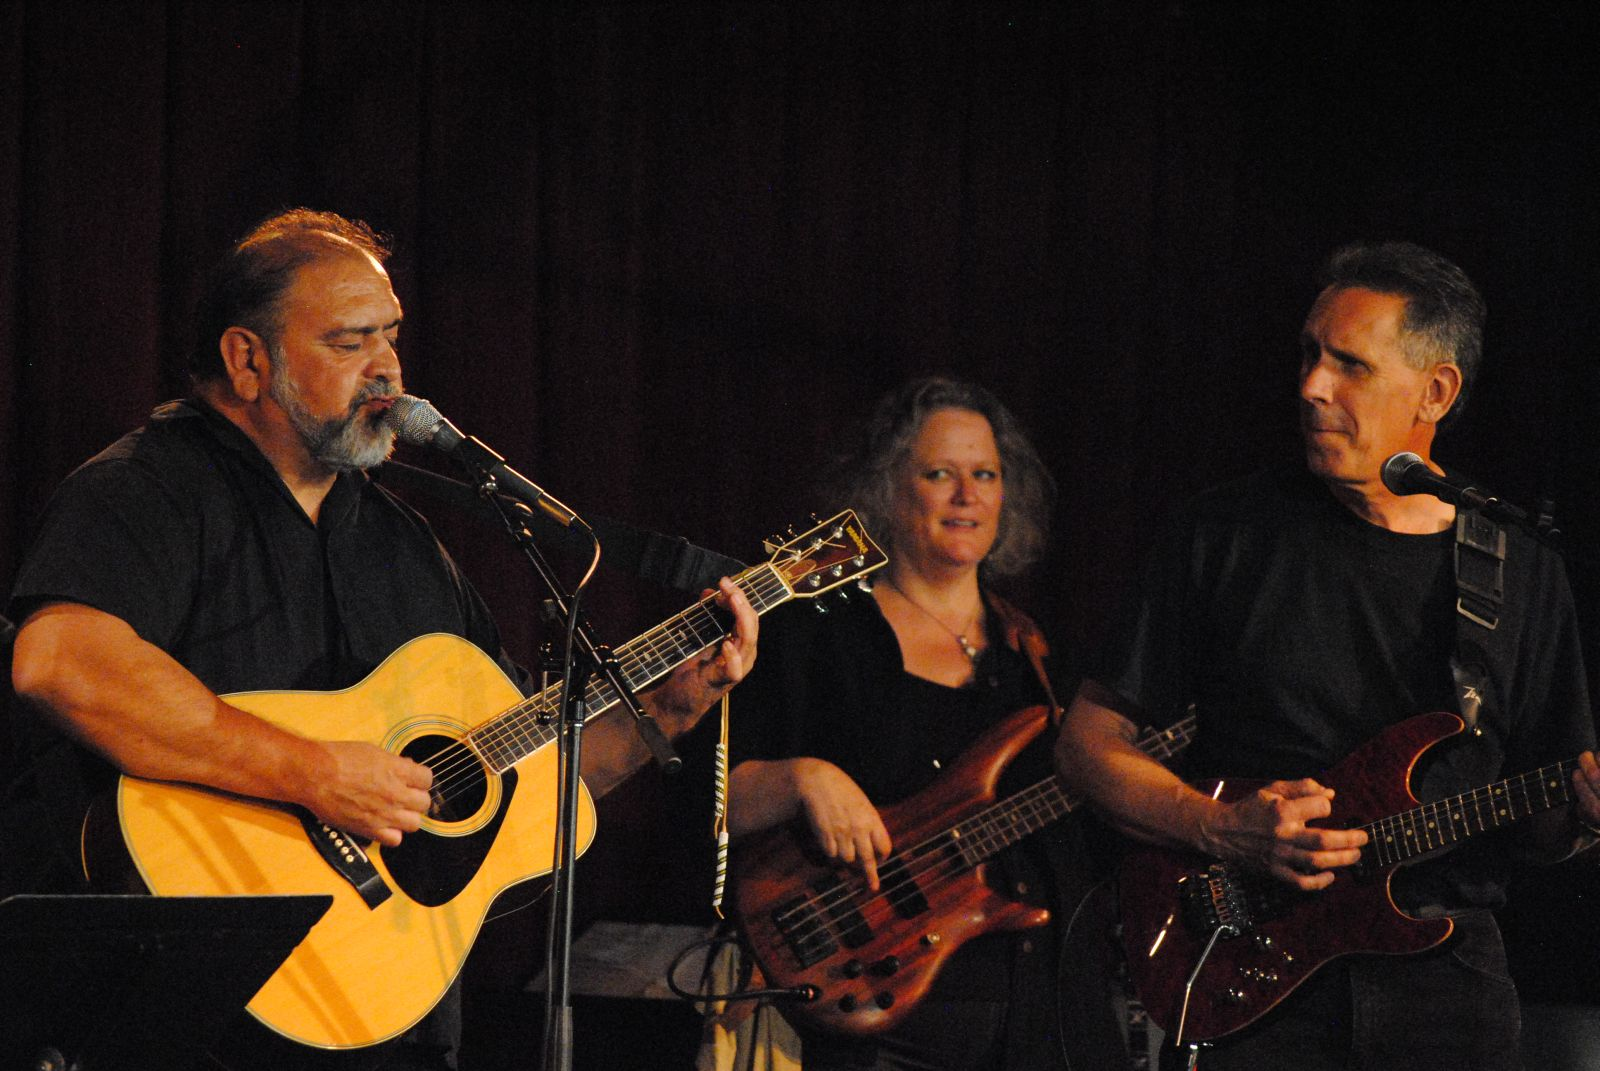 Maude Beenhower & Joe Gabel-photo by Allison Rae